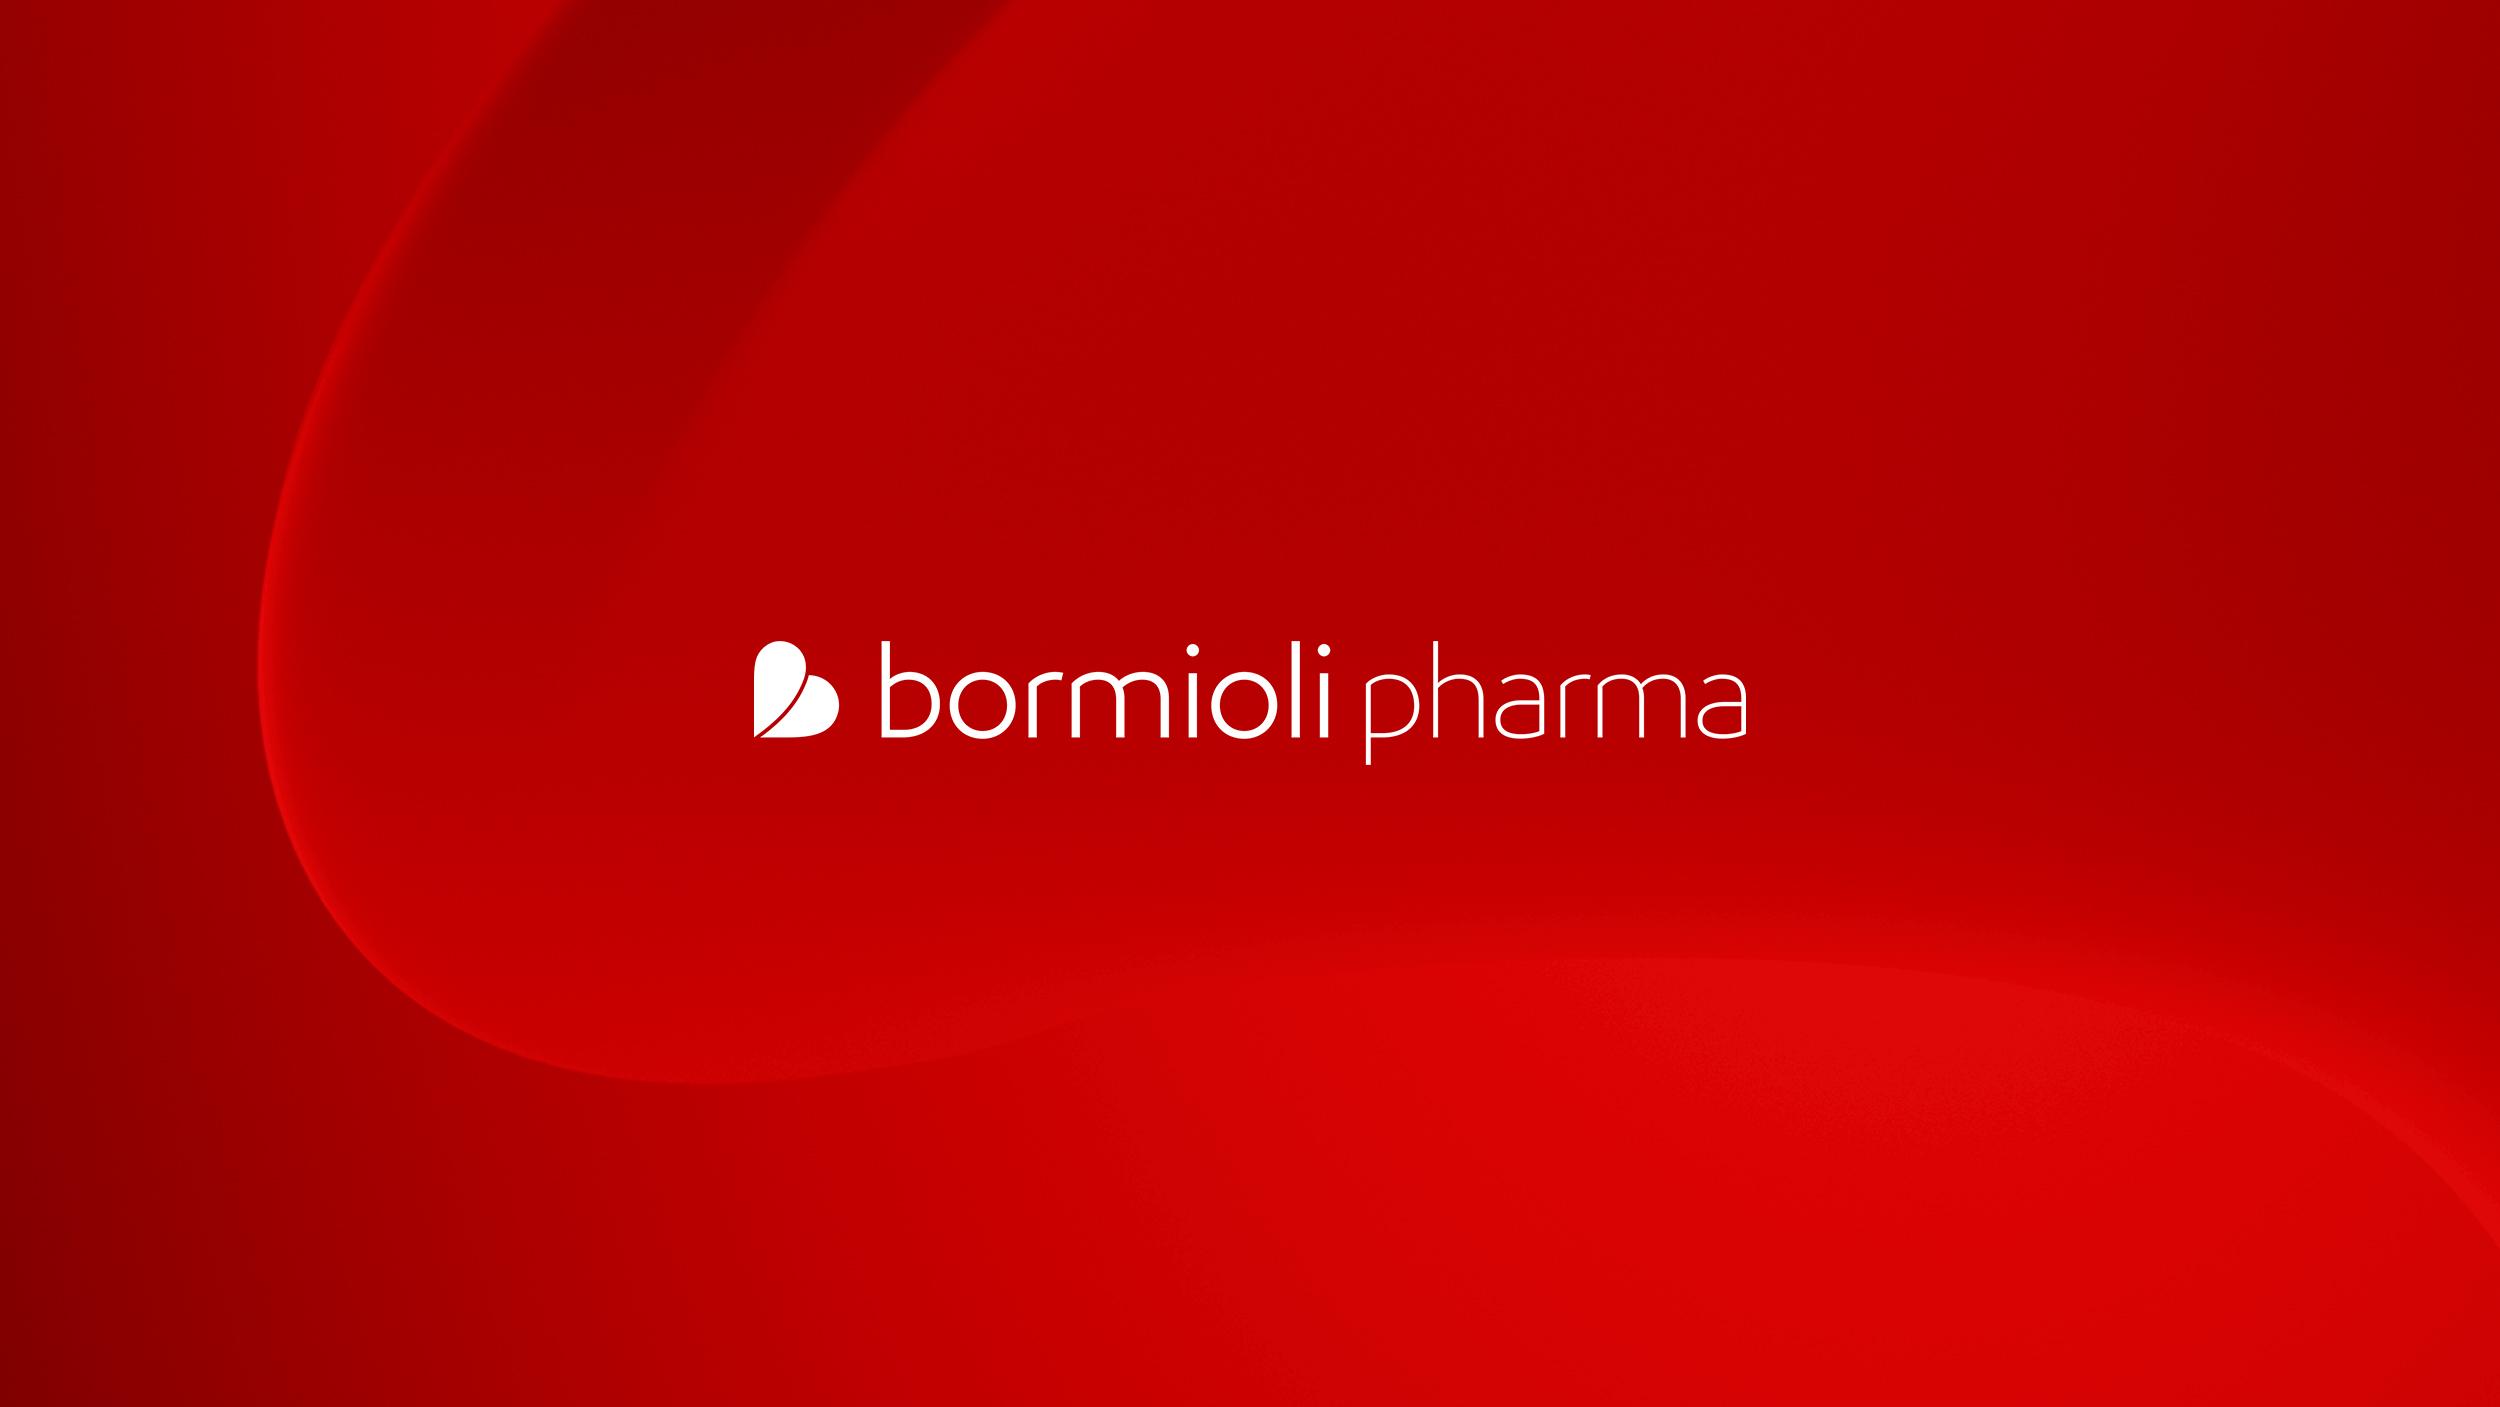 Bormioli background red.jpg